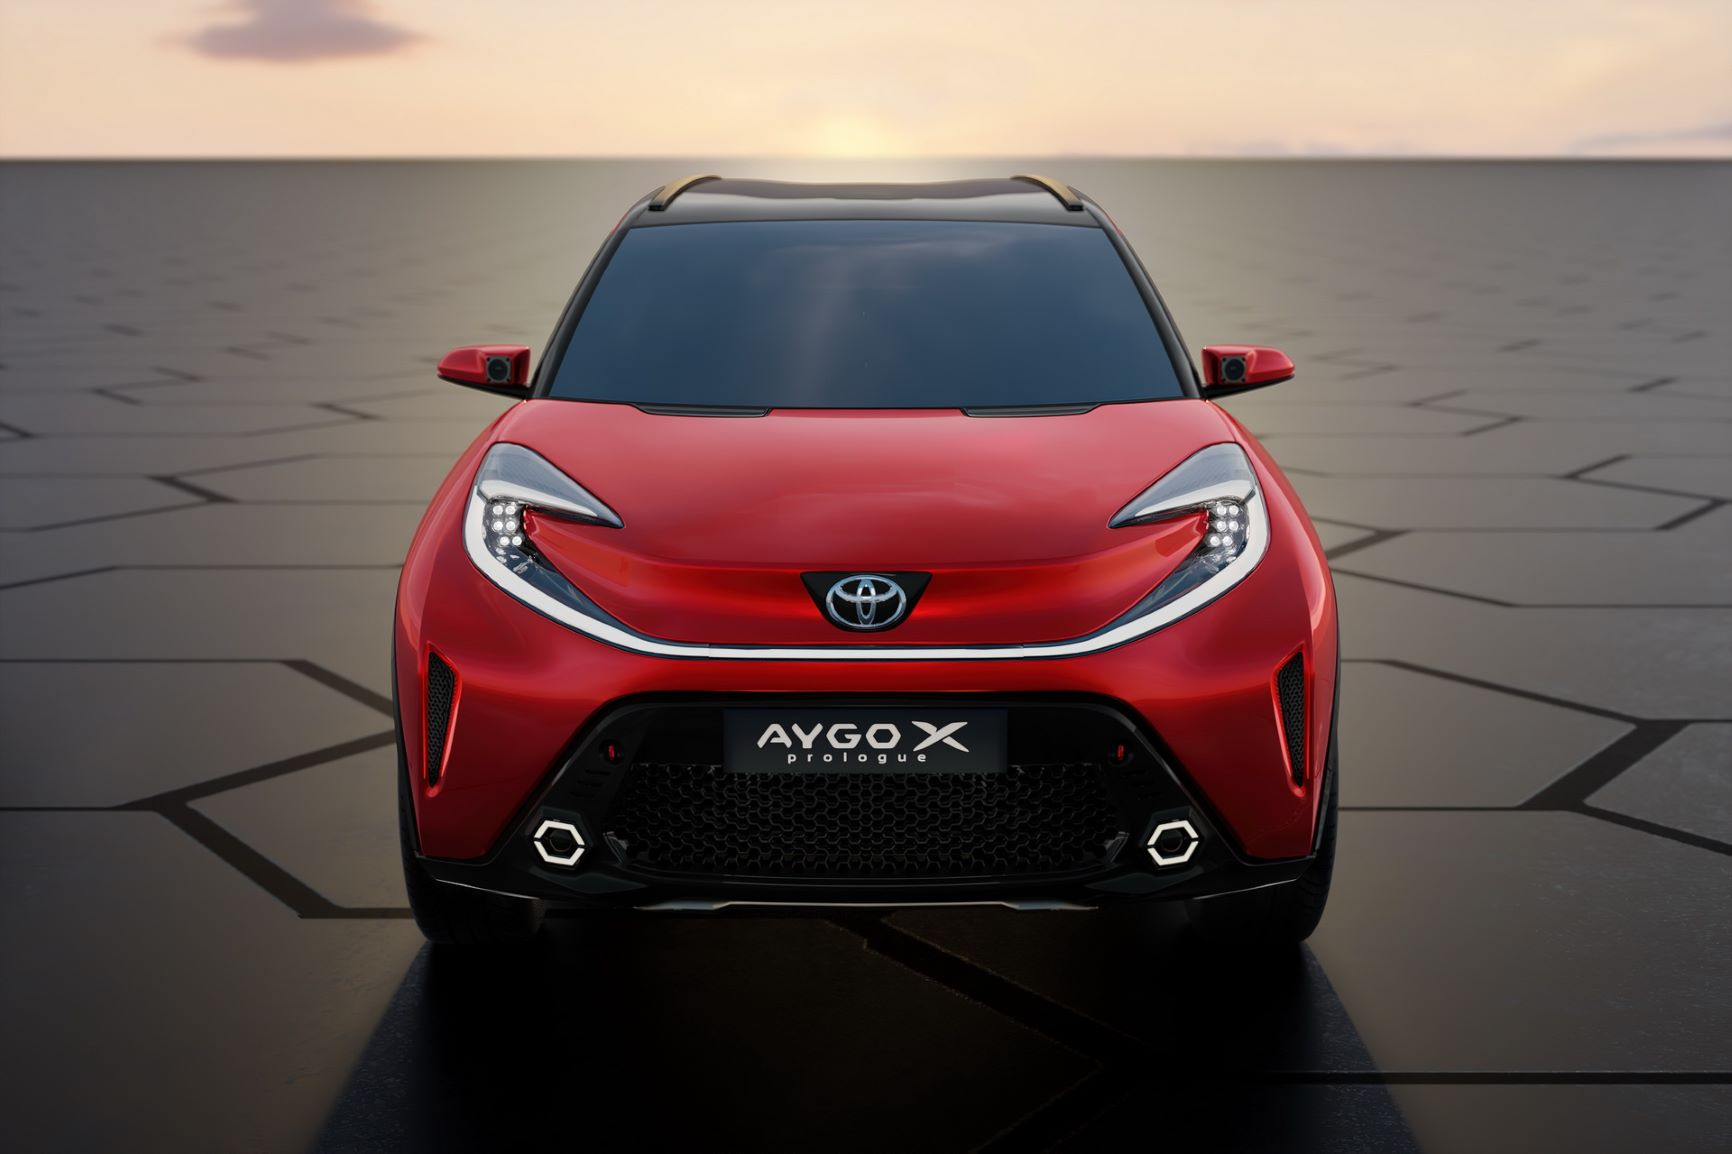 Toyota confirma Aygo X para o segmento A 13